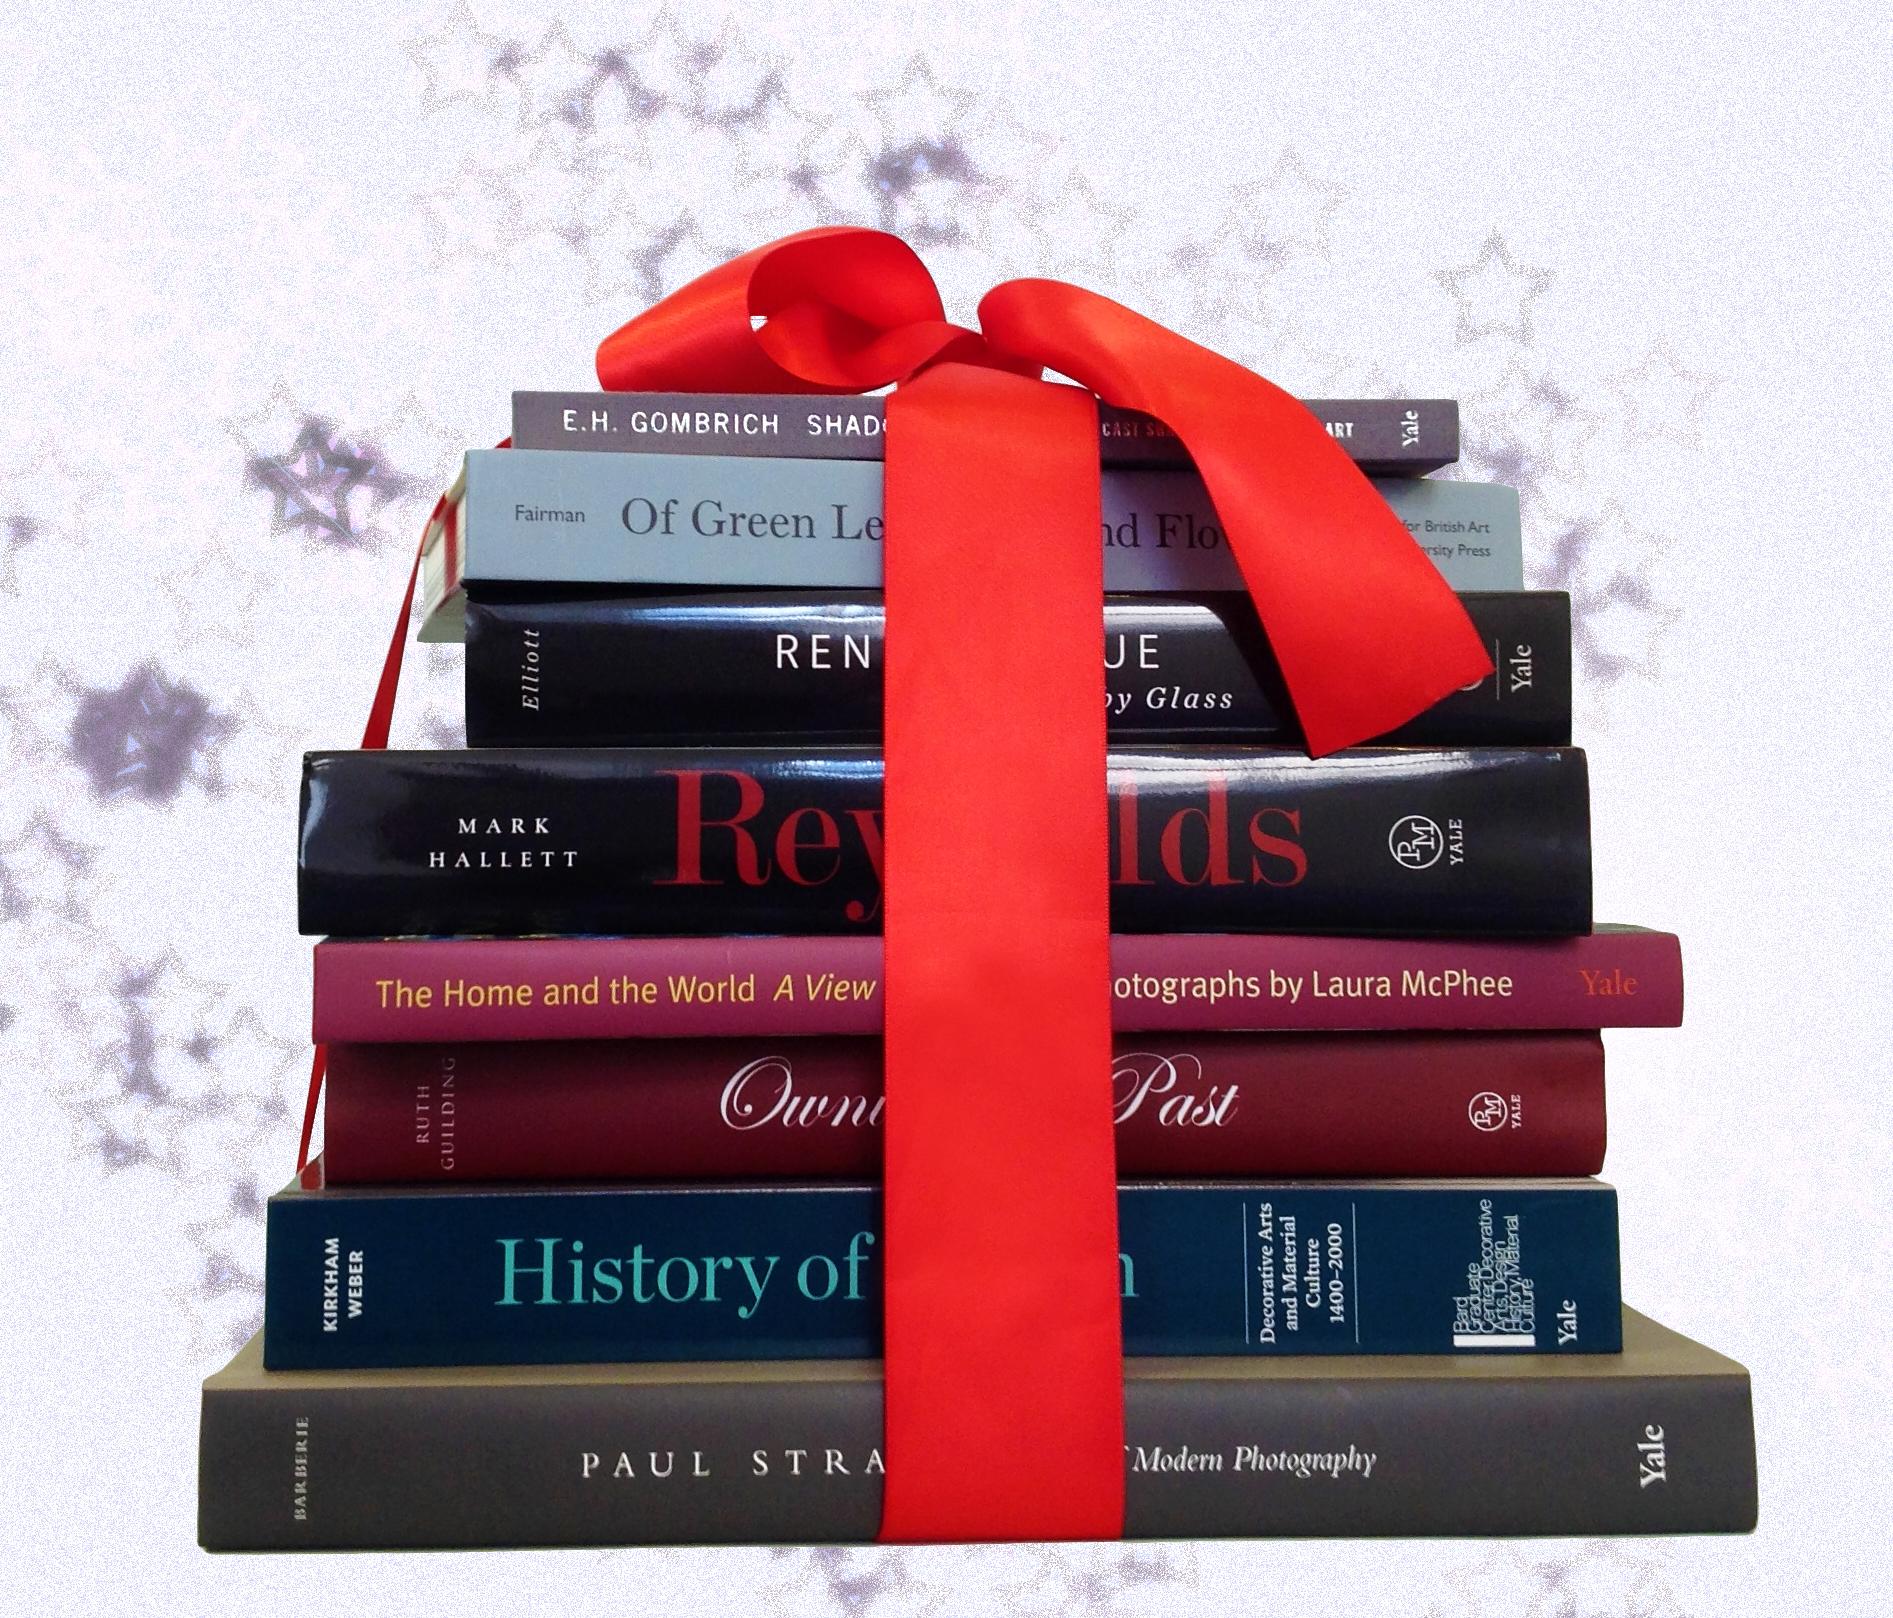 Biasakan Hadiah Berupa Buku